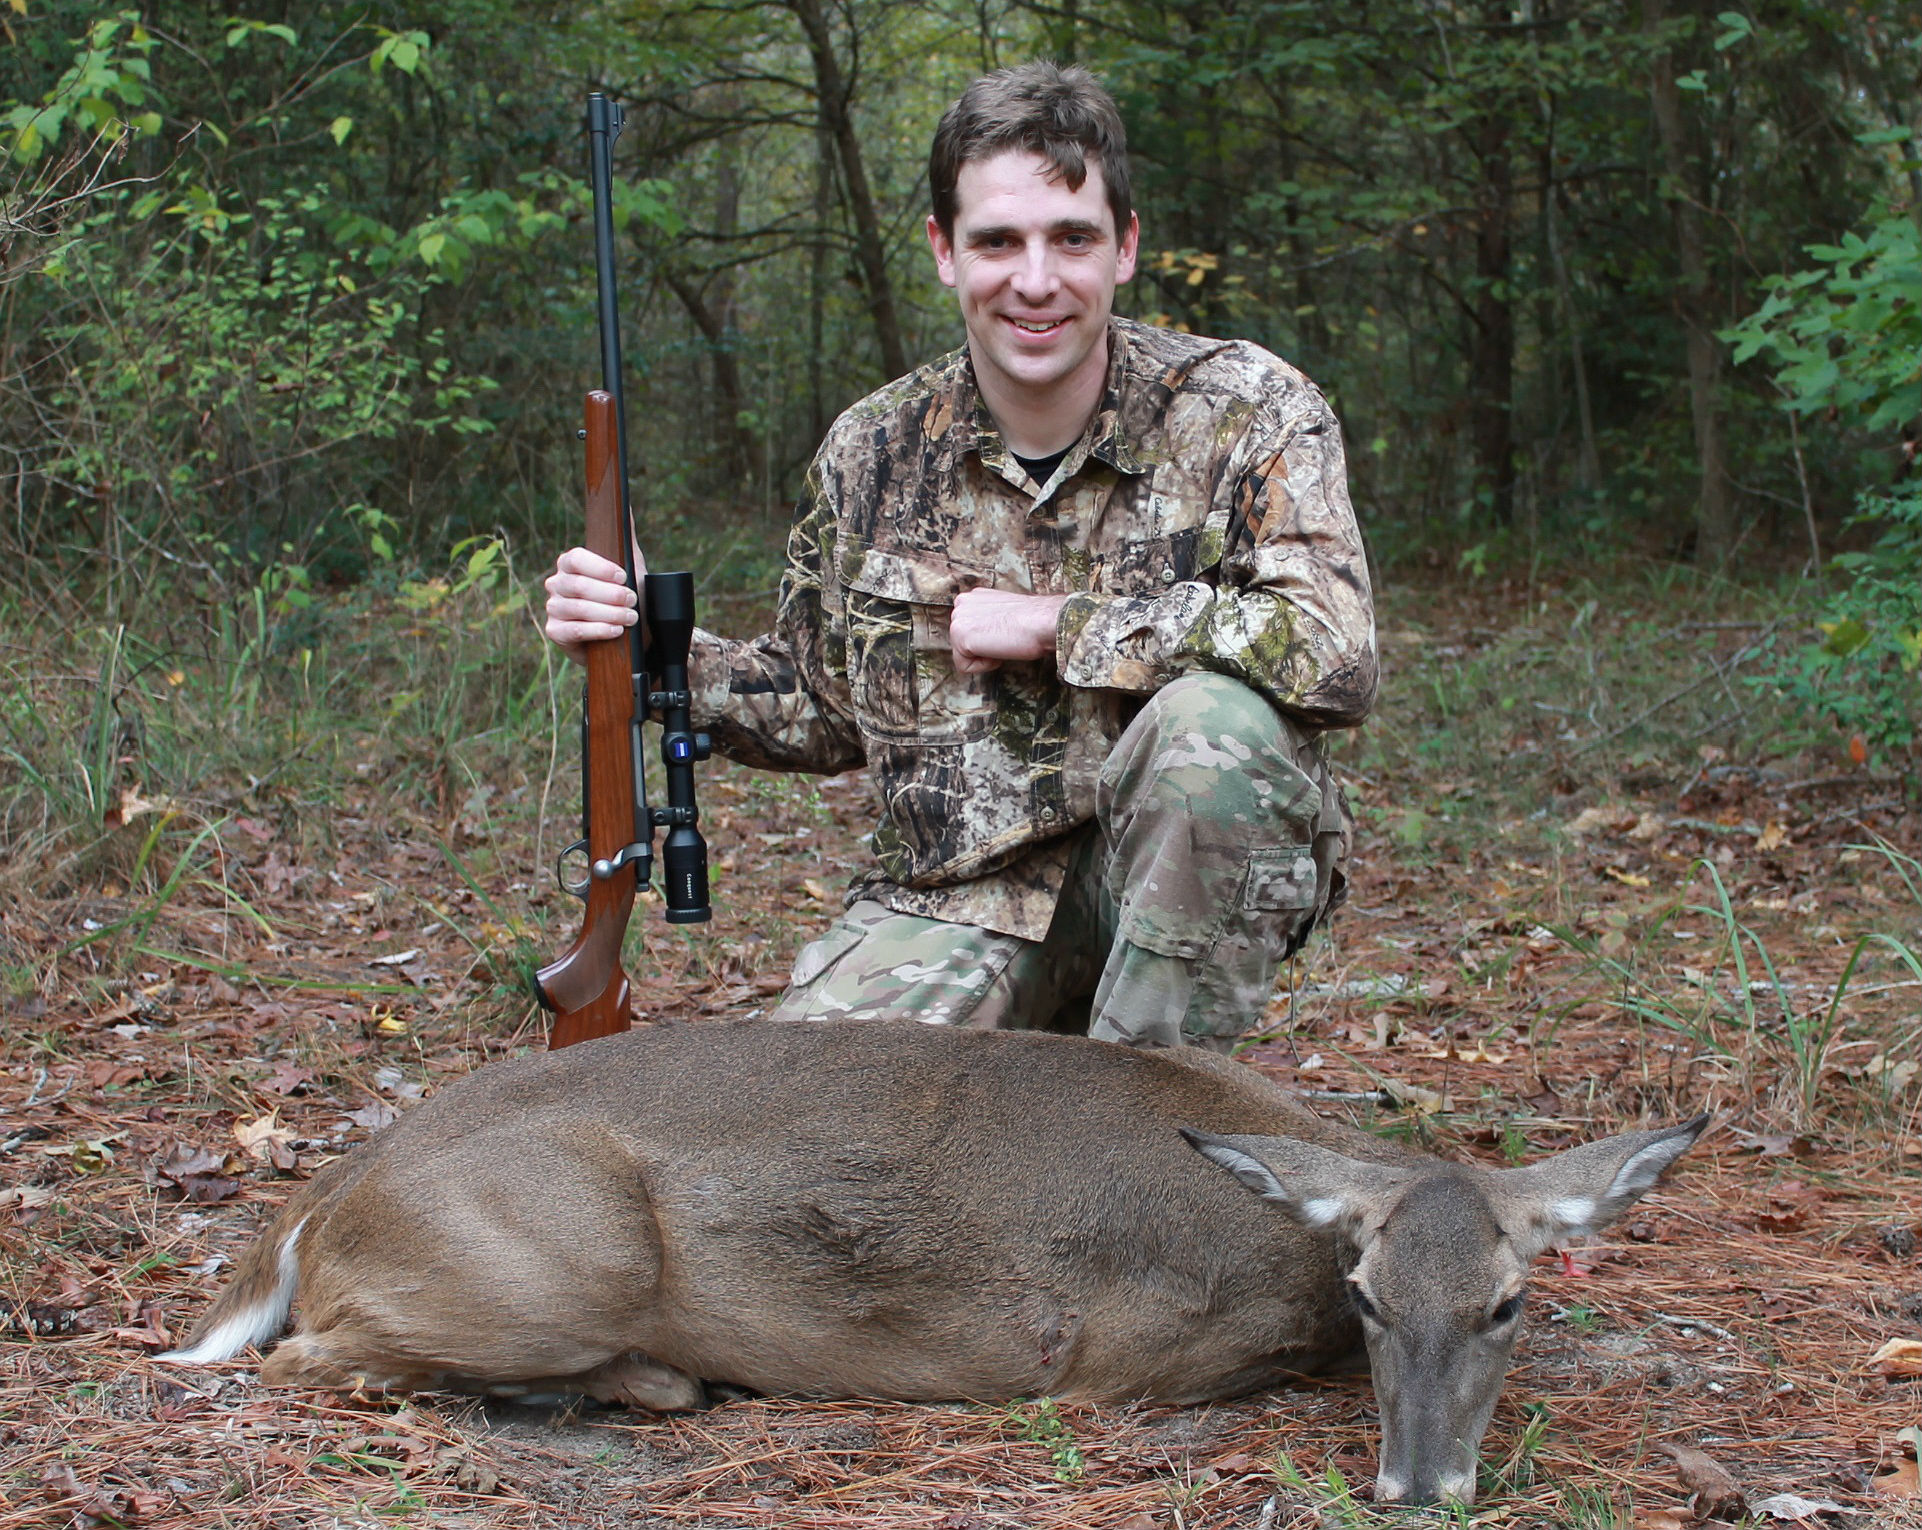 Despite the rain, Texas deer season opens with a bang